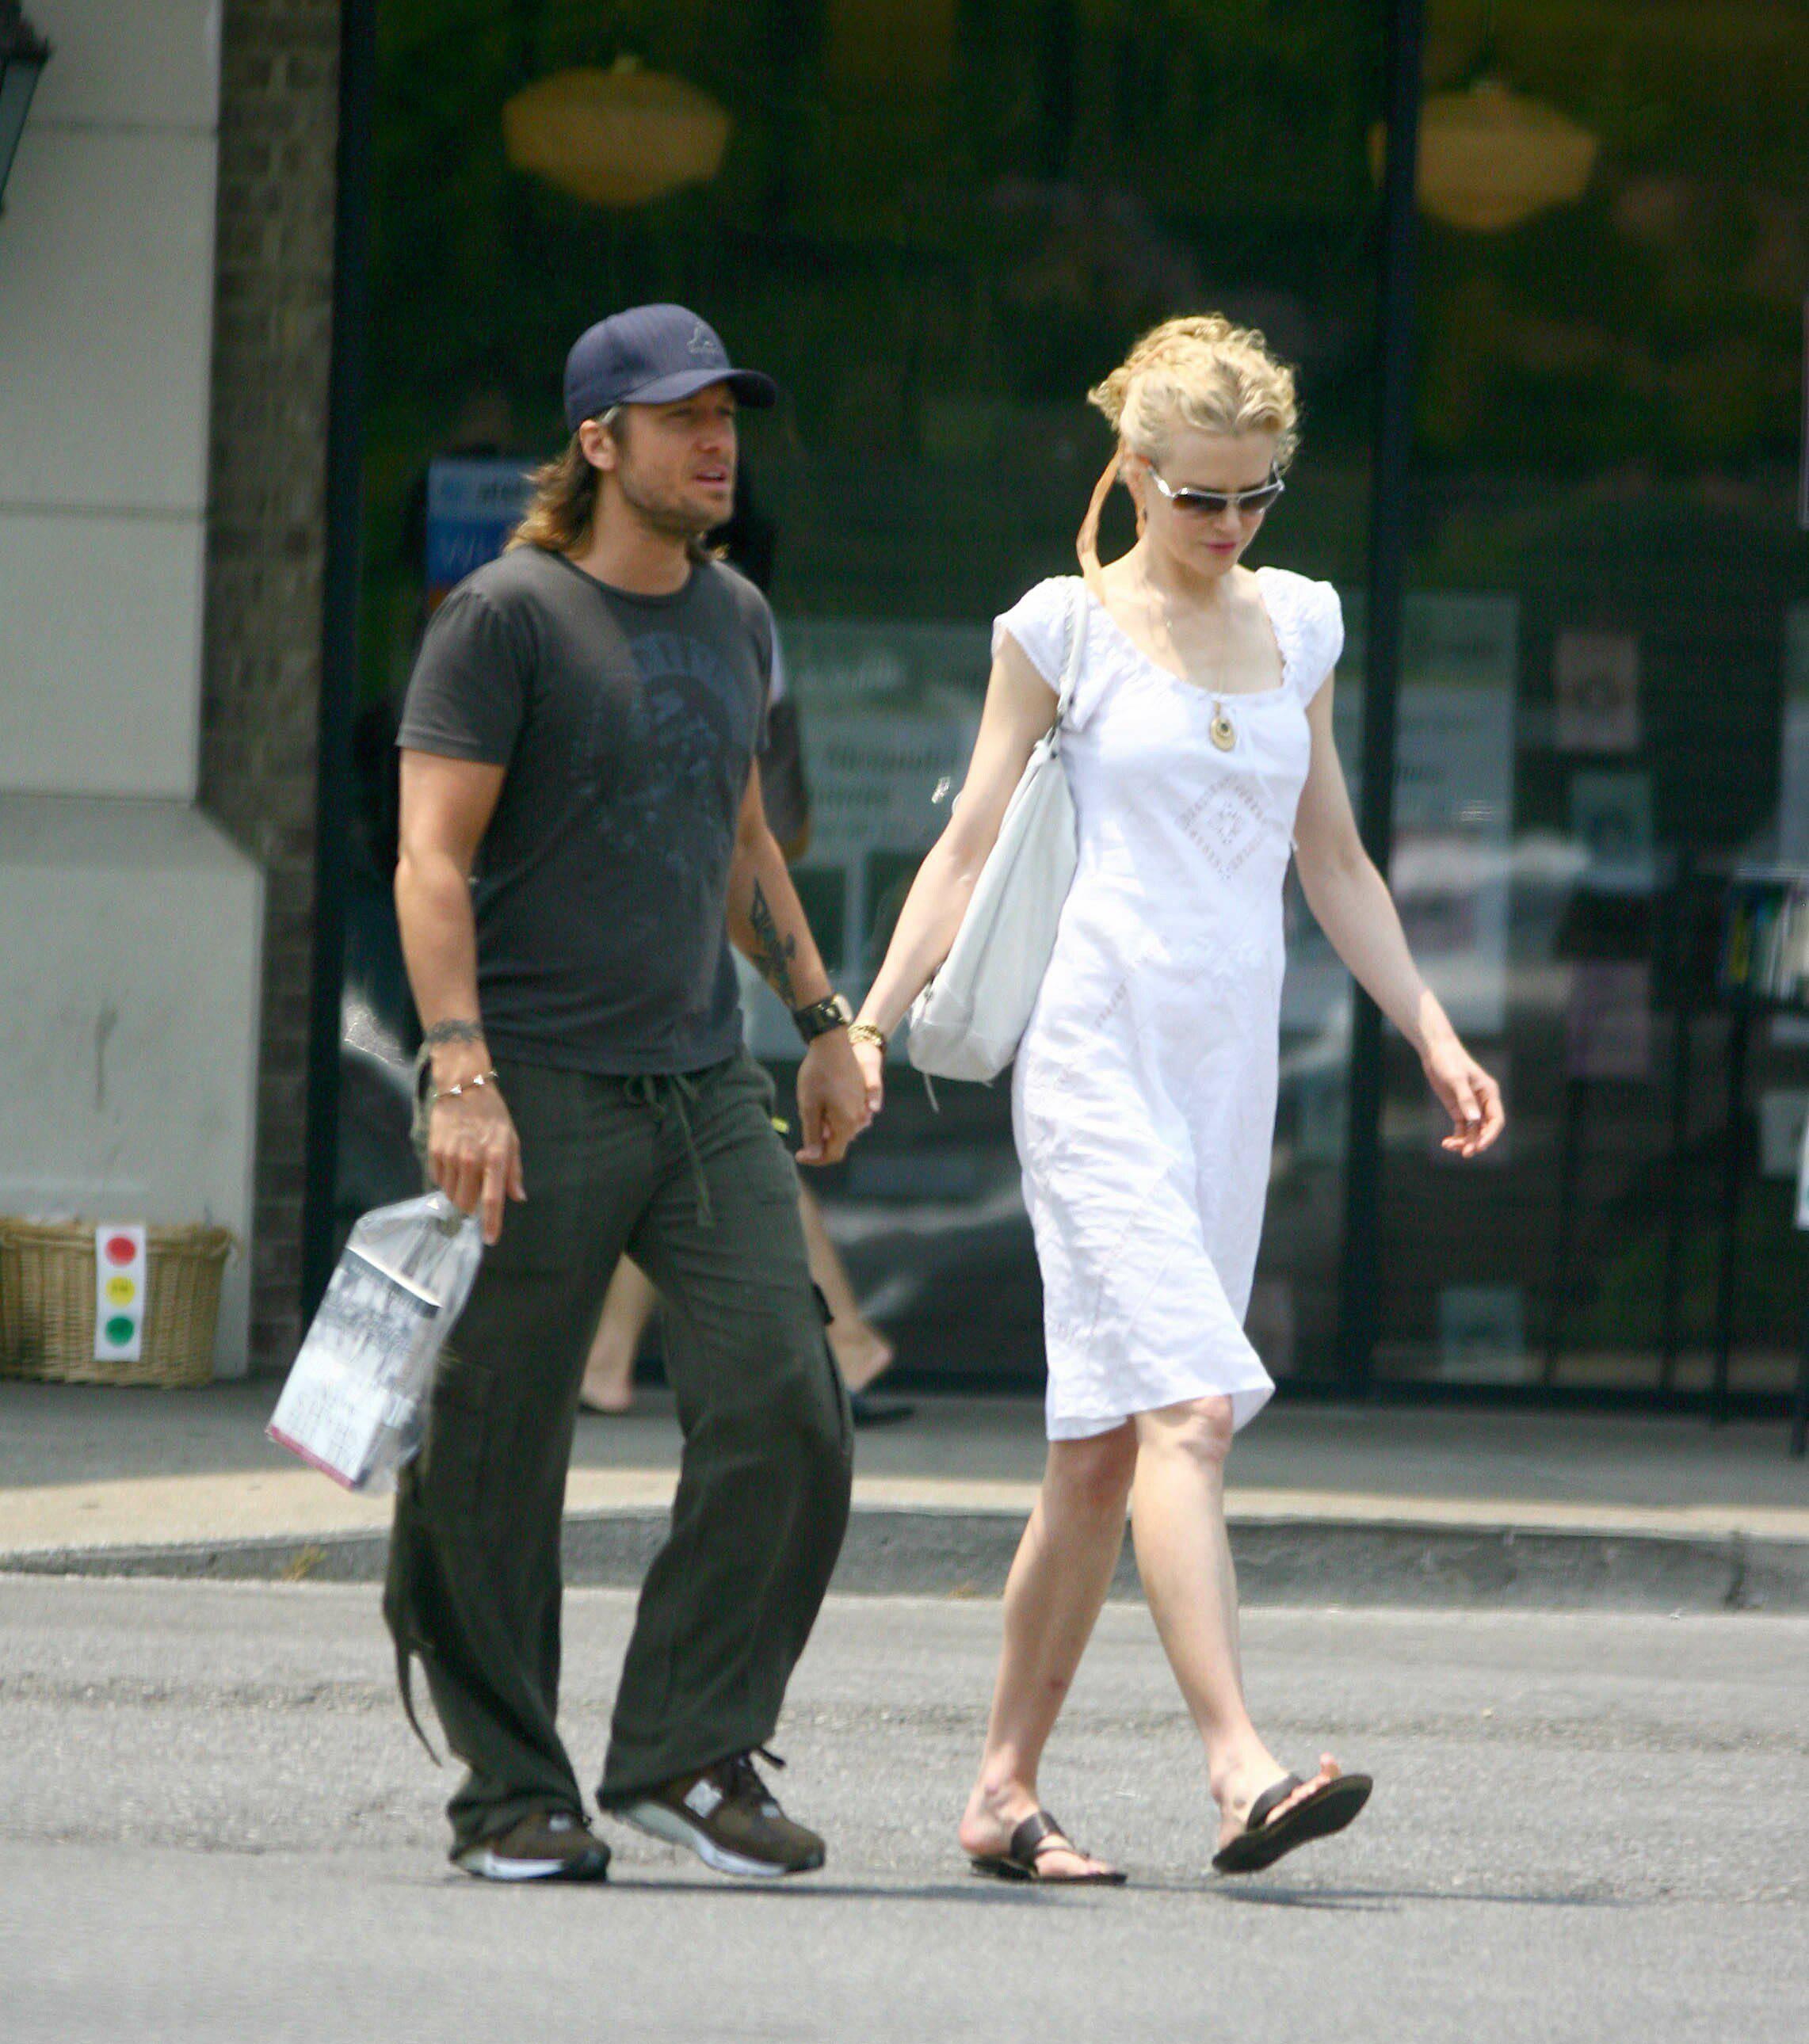 25755_Nicole_Kidman_and_Keith_Urban_buy_a_book_in_Nashville_02_447lo.jpg